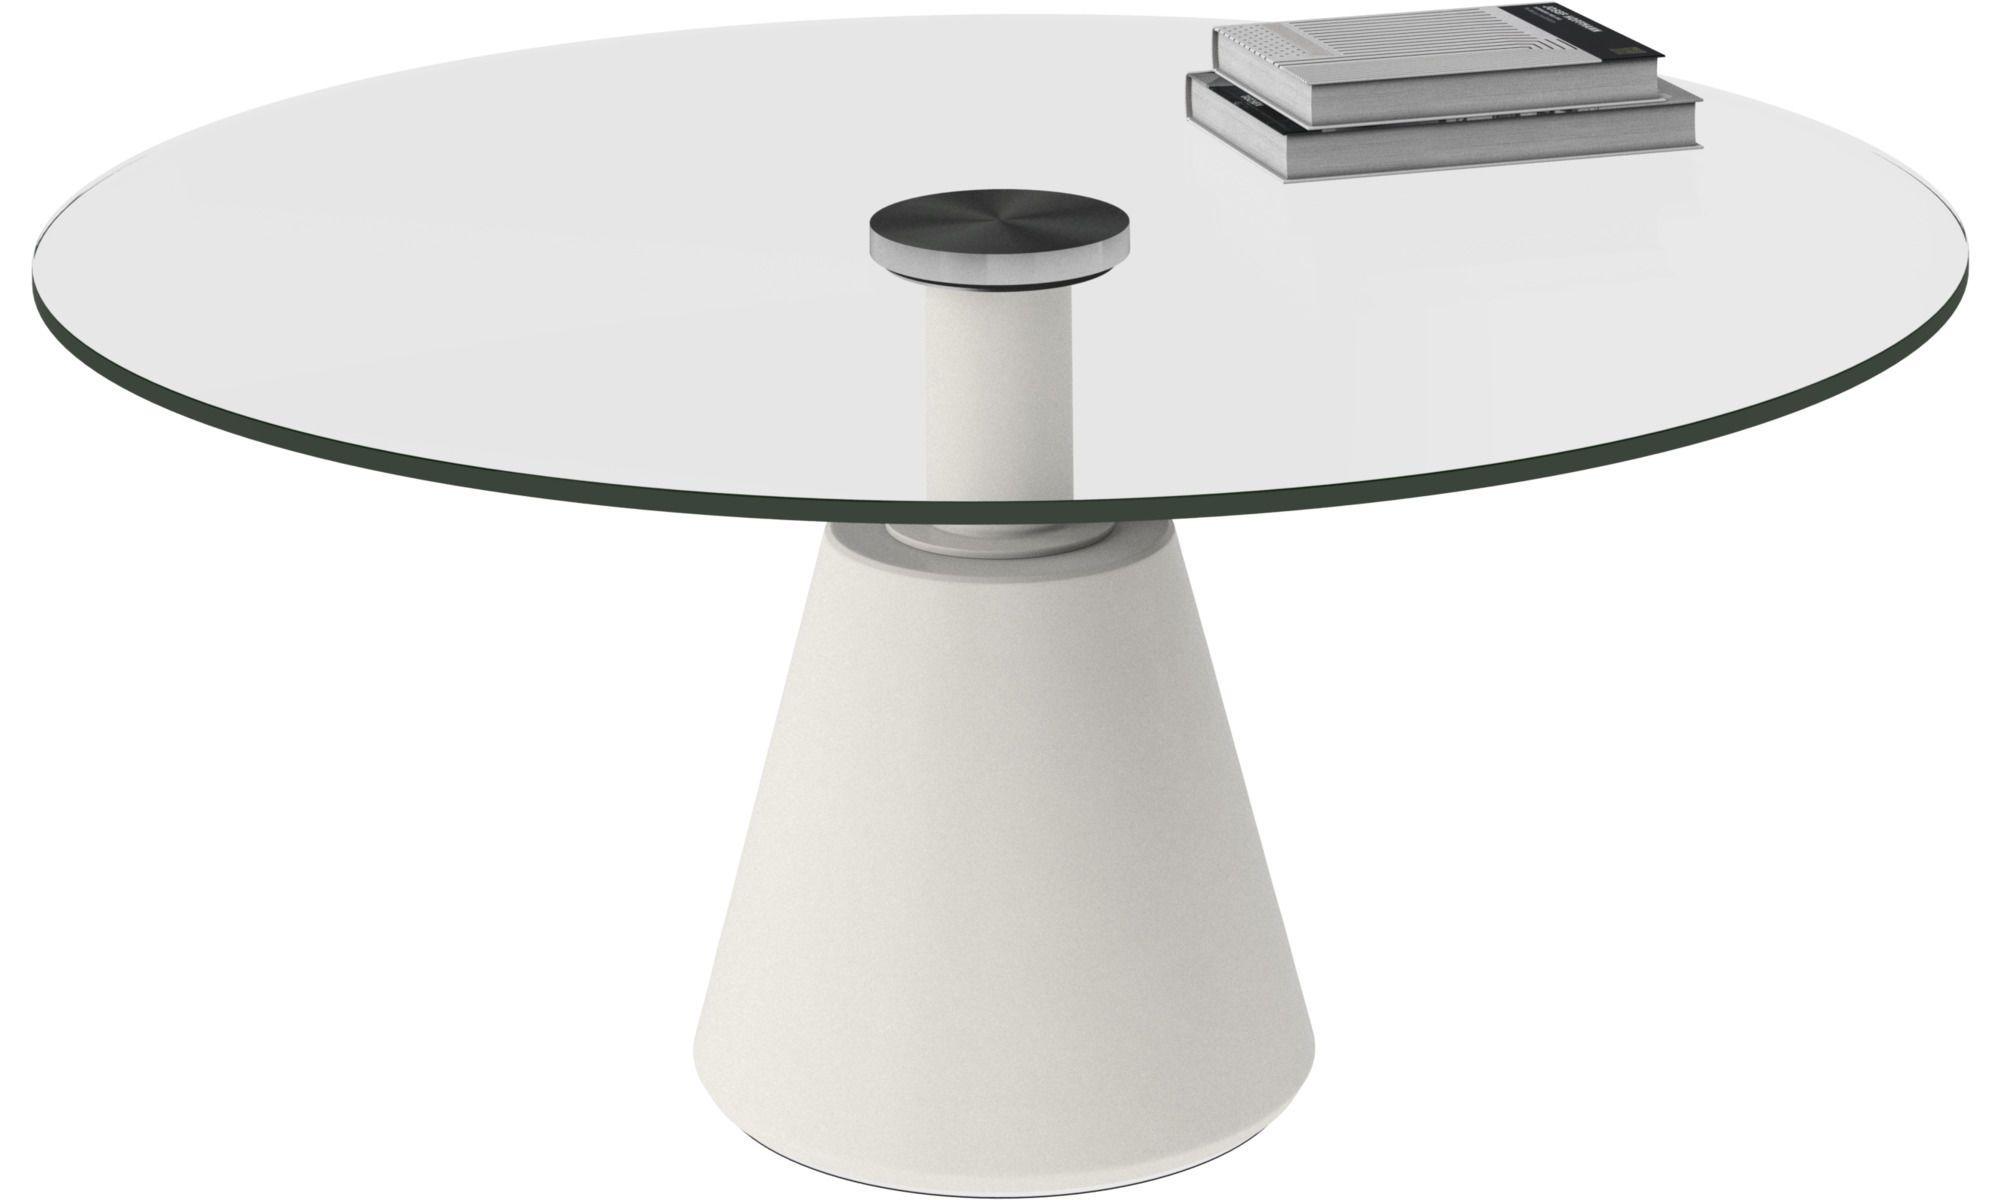 Coffee Tables Madrid Coffee Table Table Coffee Table Round Coffee Table [ 1200 x 2000 Pixel ]